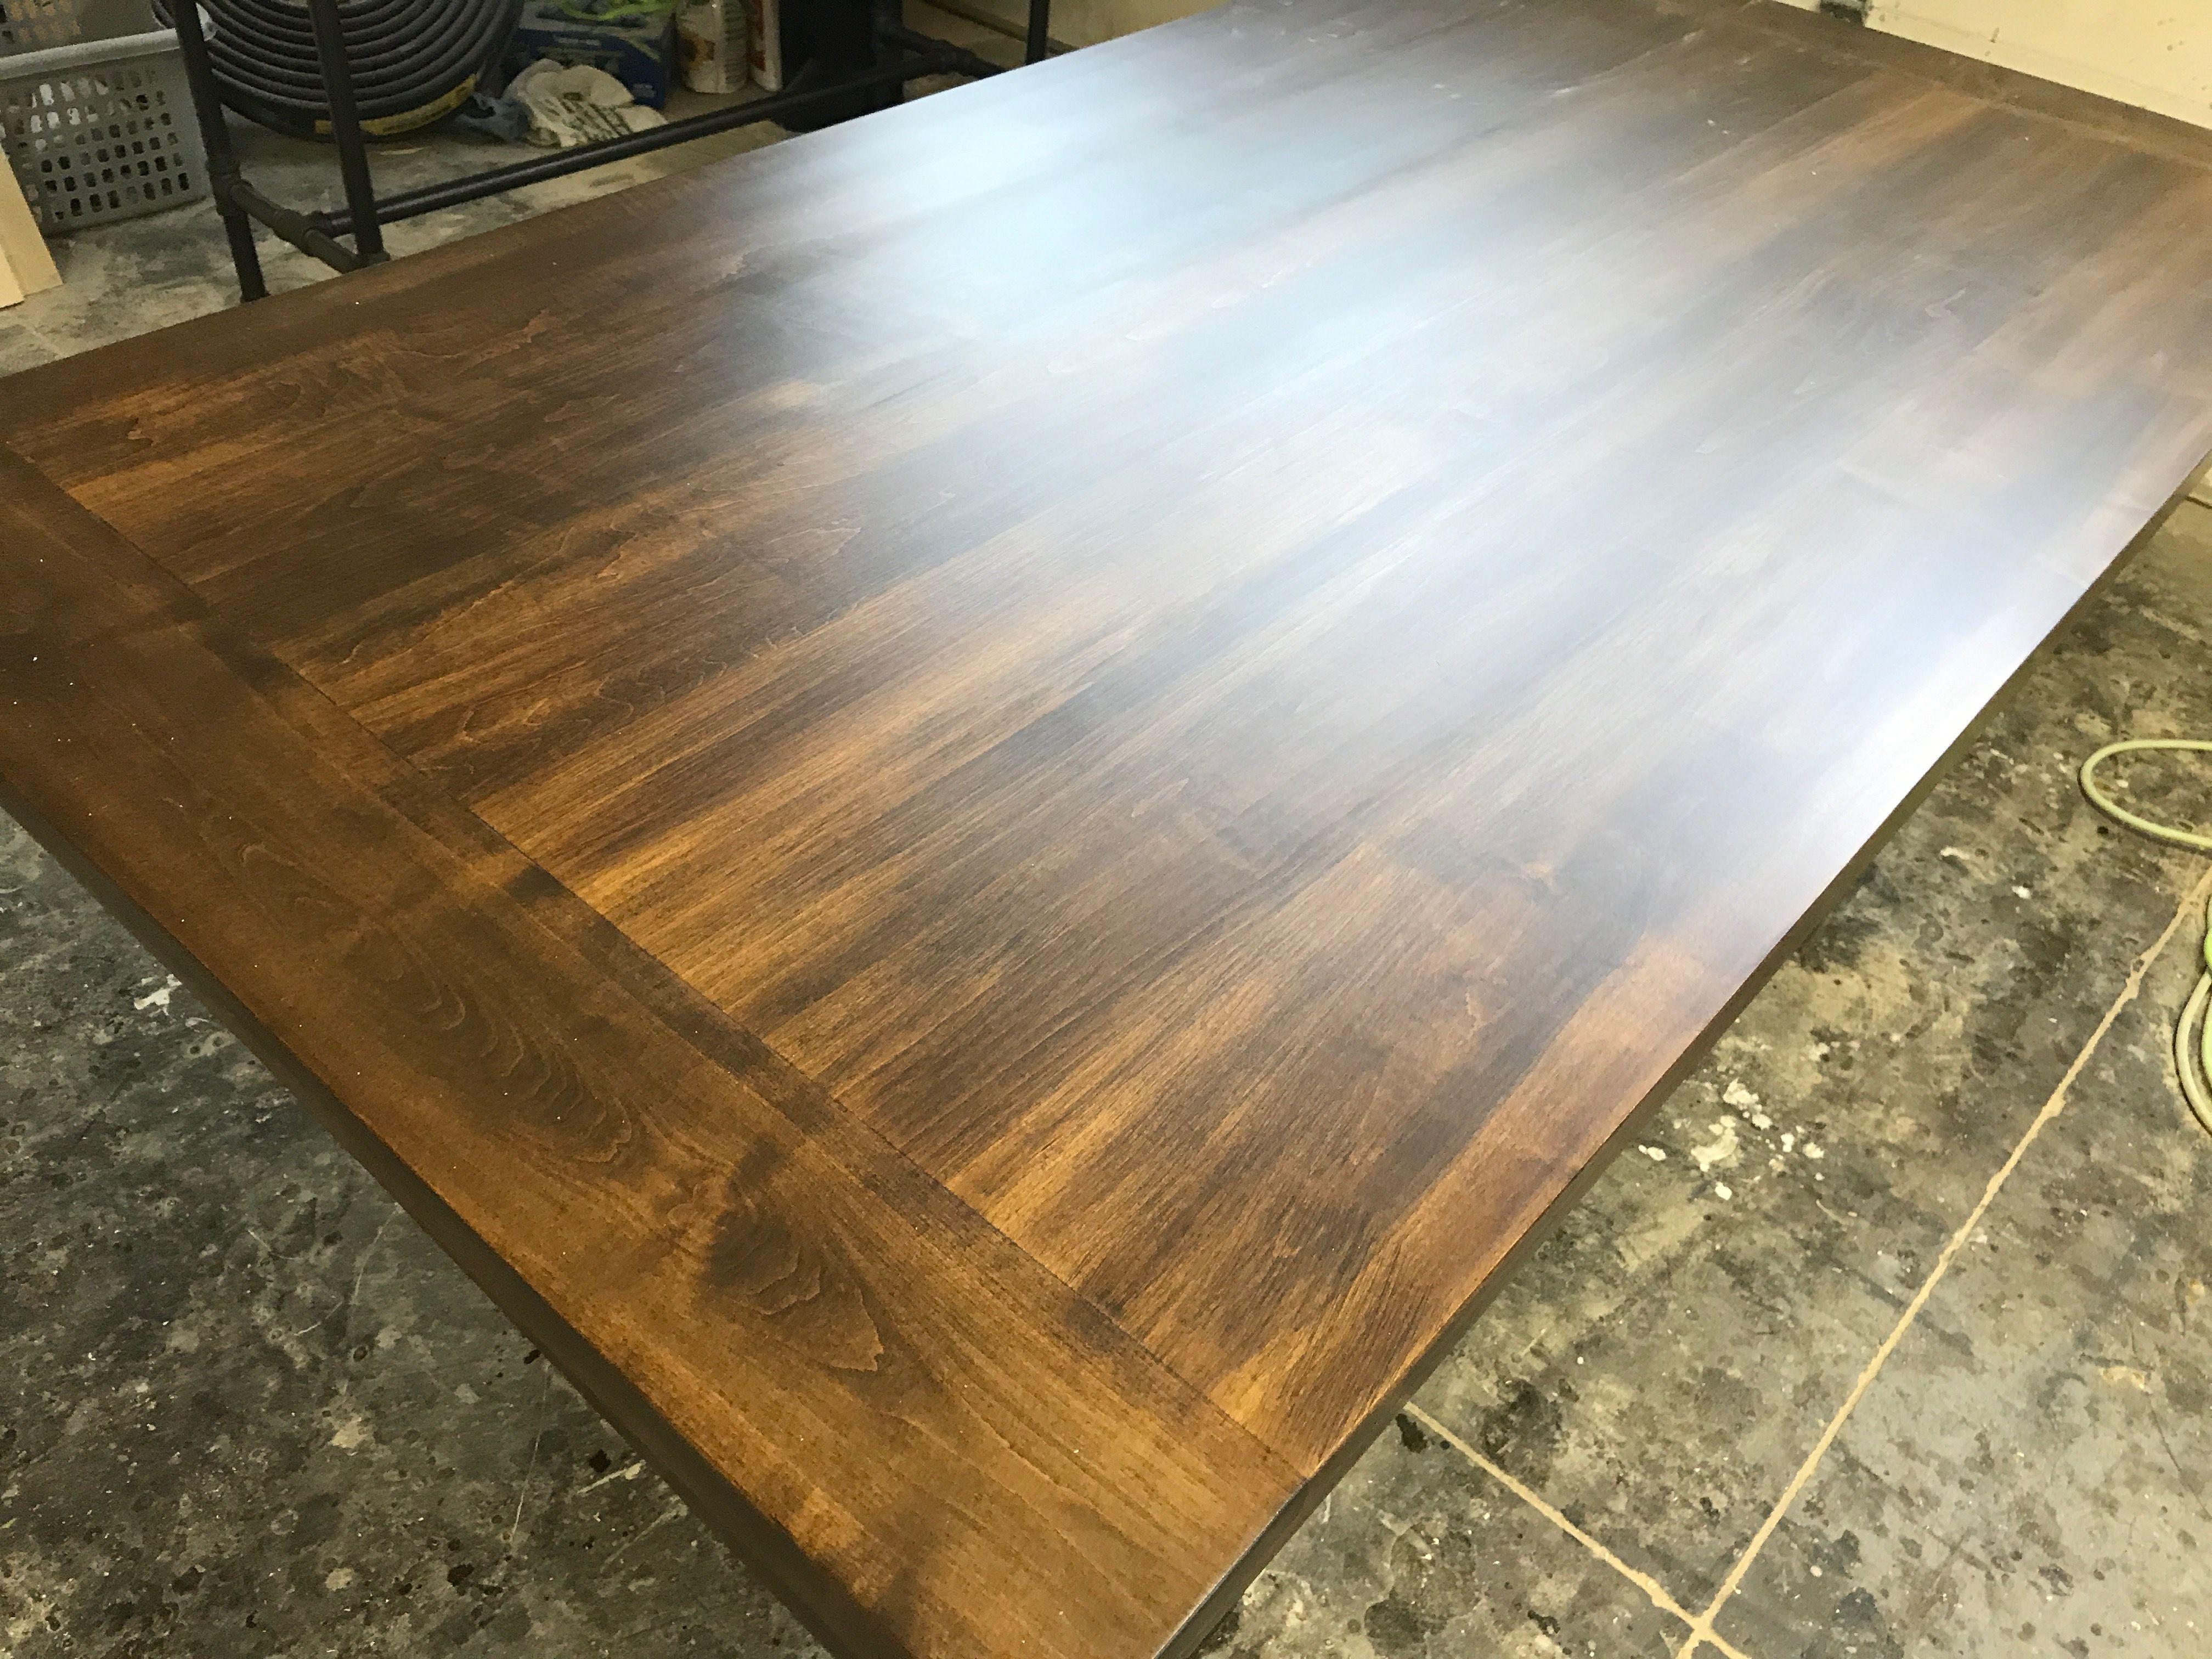 Maple Tabletop Done In Dark Walnut With Bread Board Ends